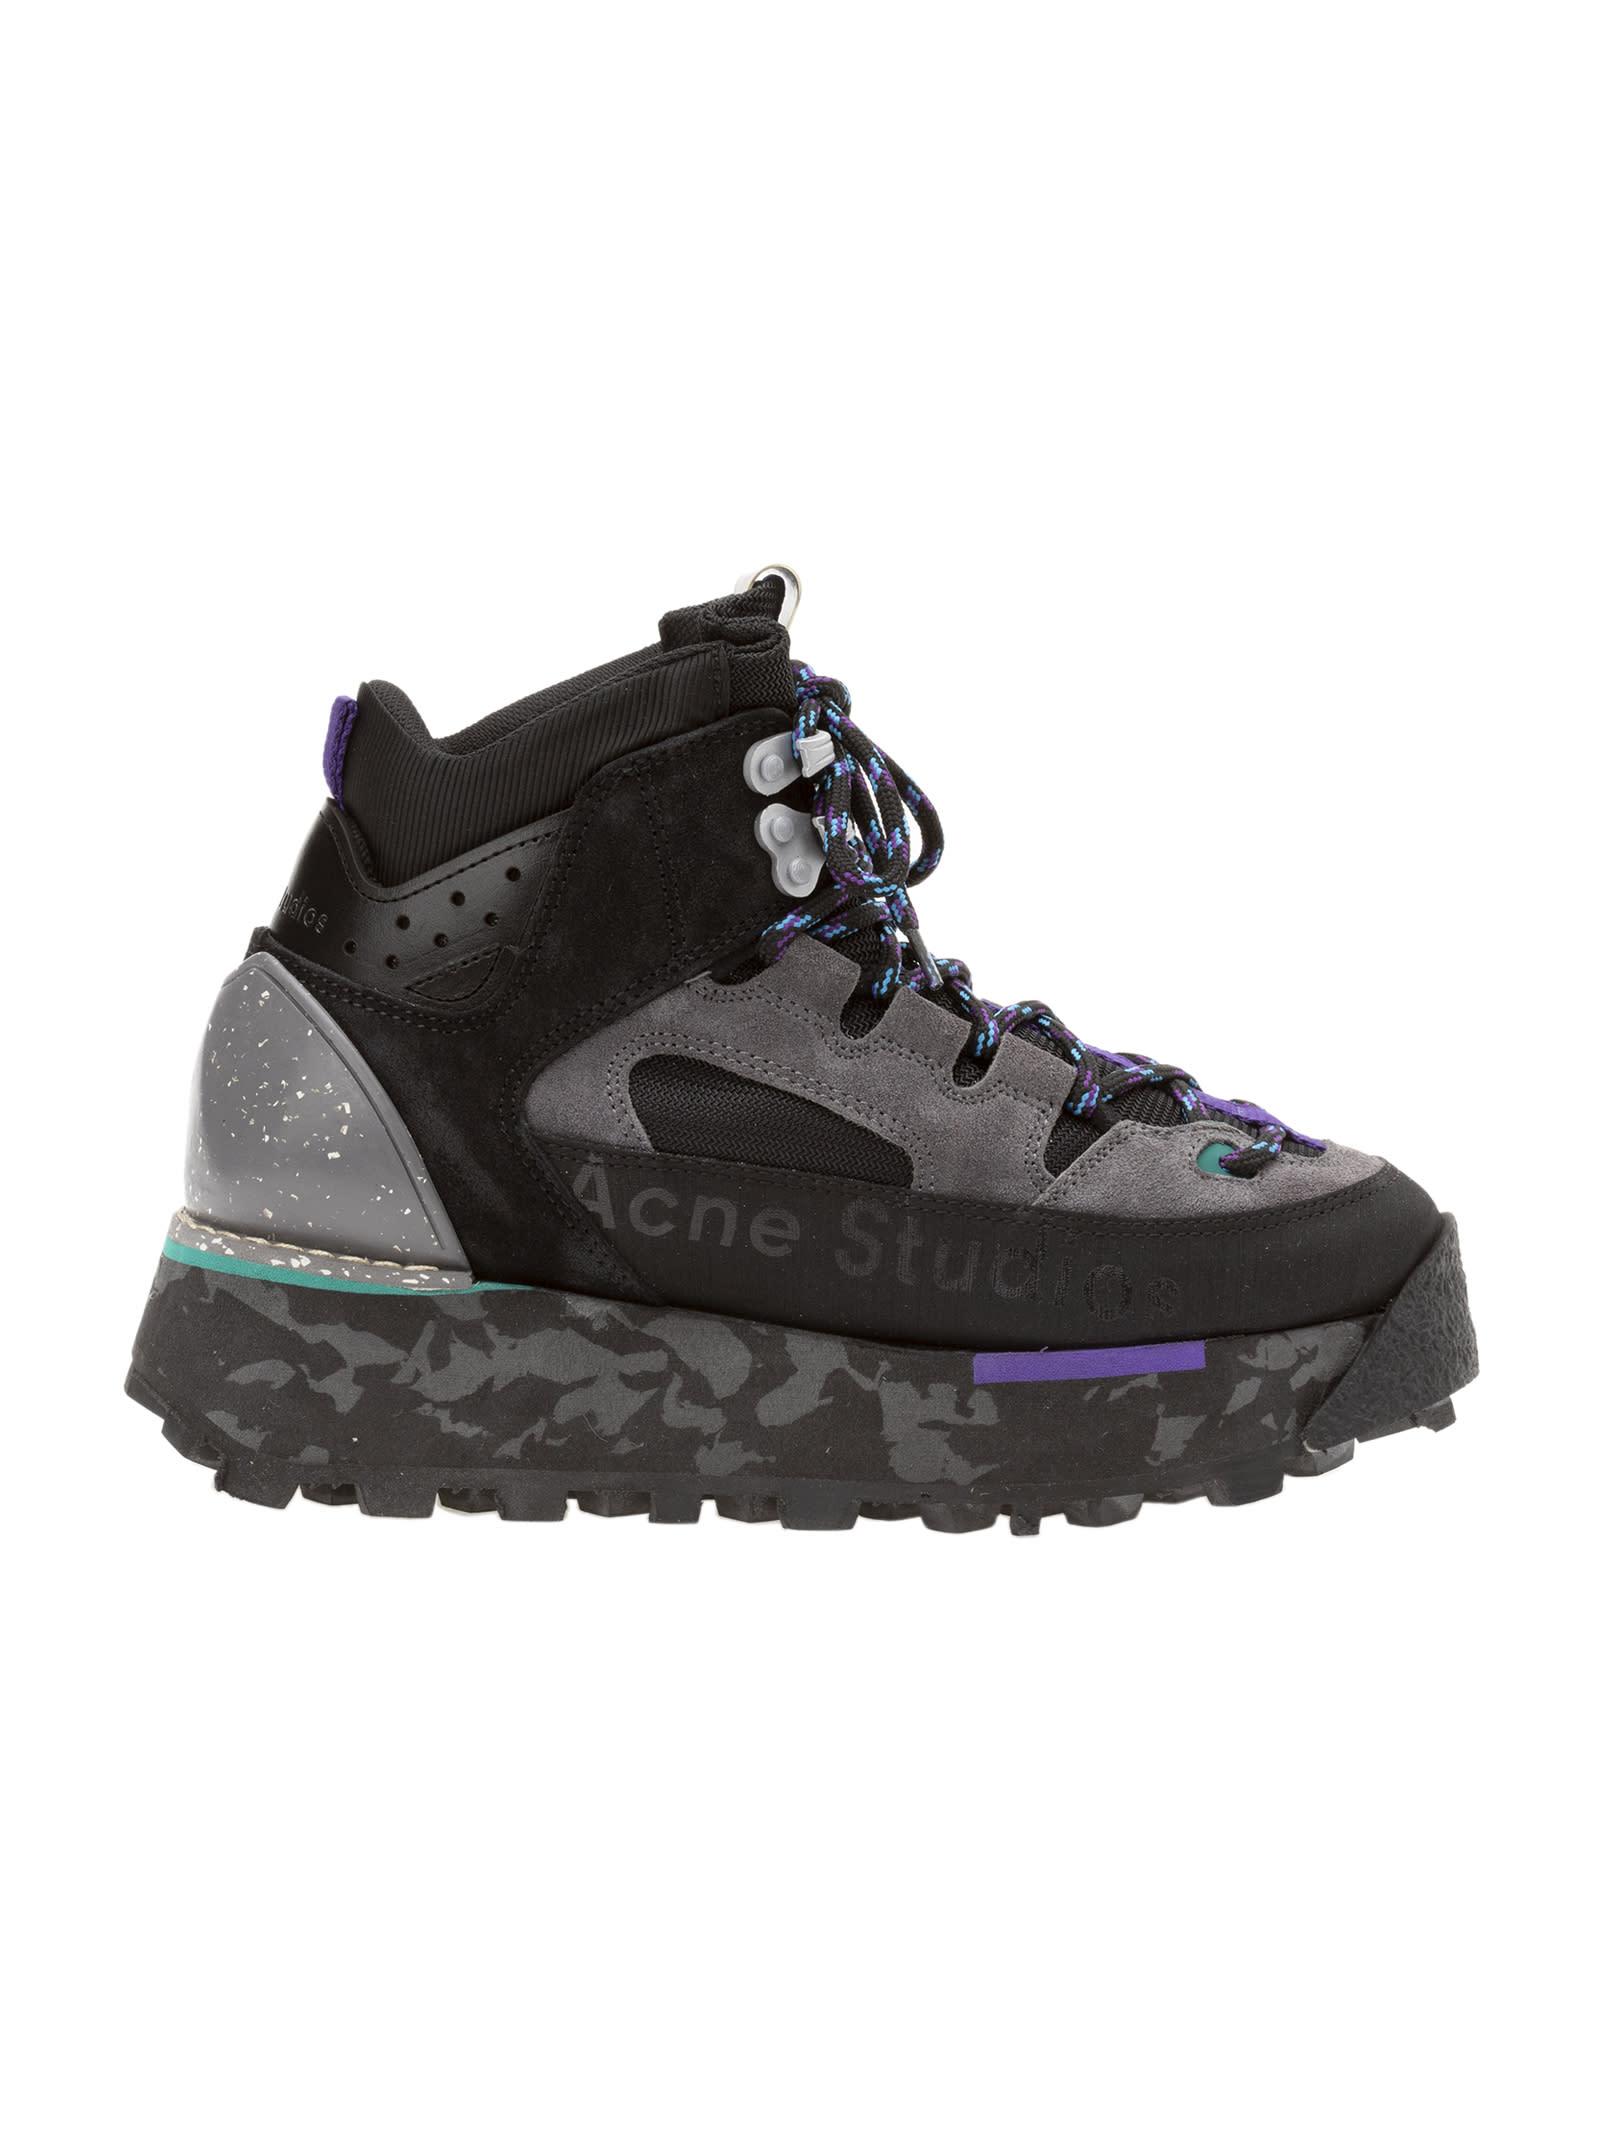 new product d4460 7e134 Acne Studios Bertrand W Shoes